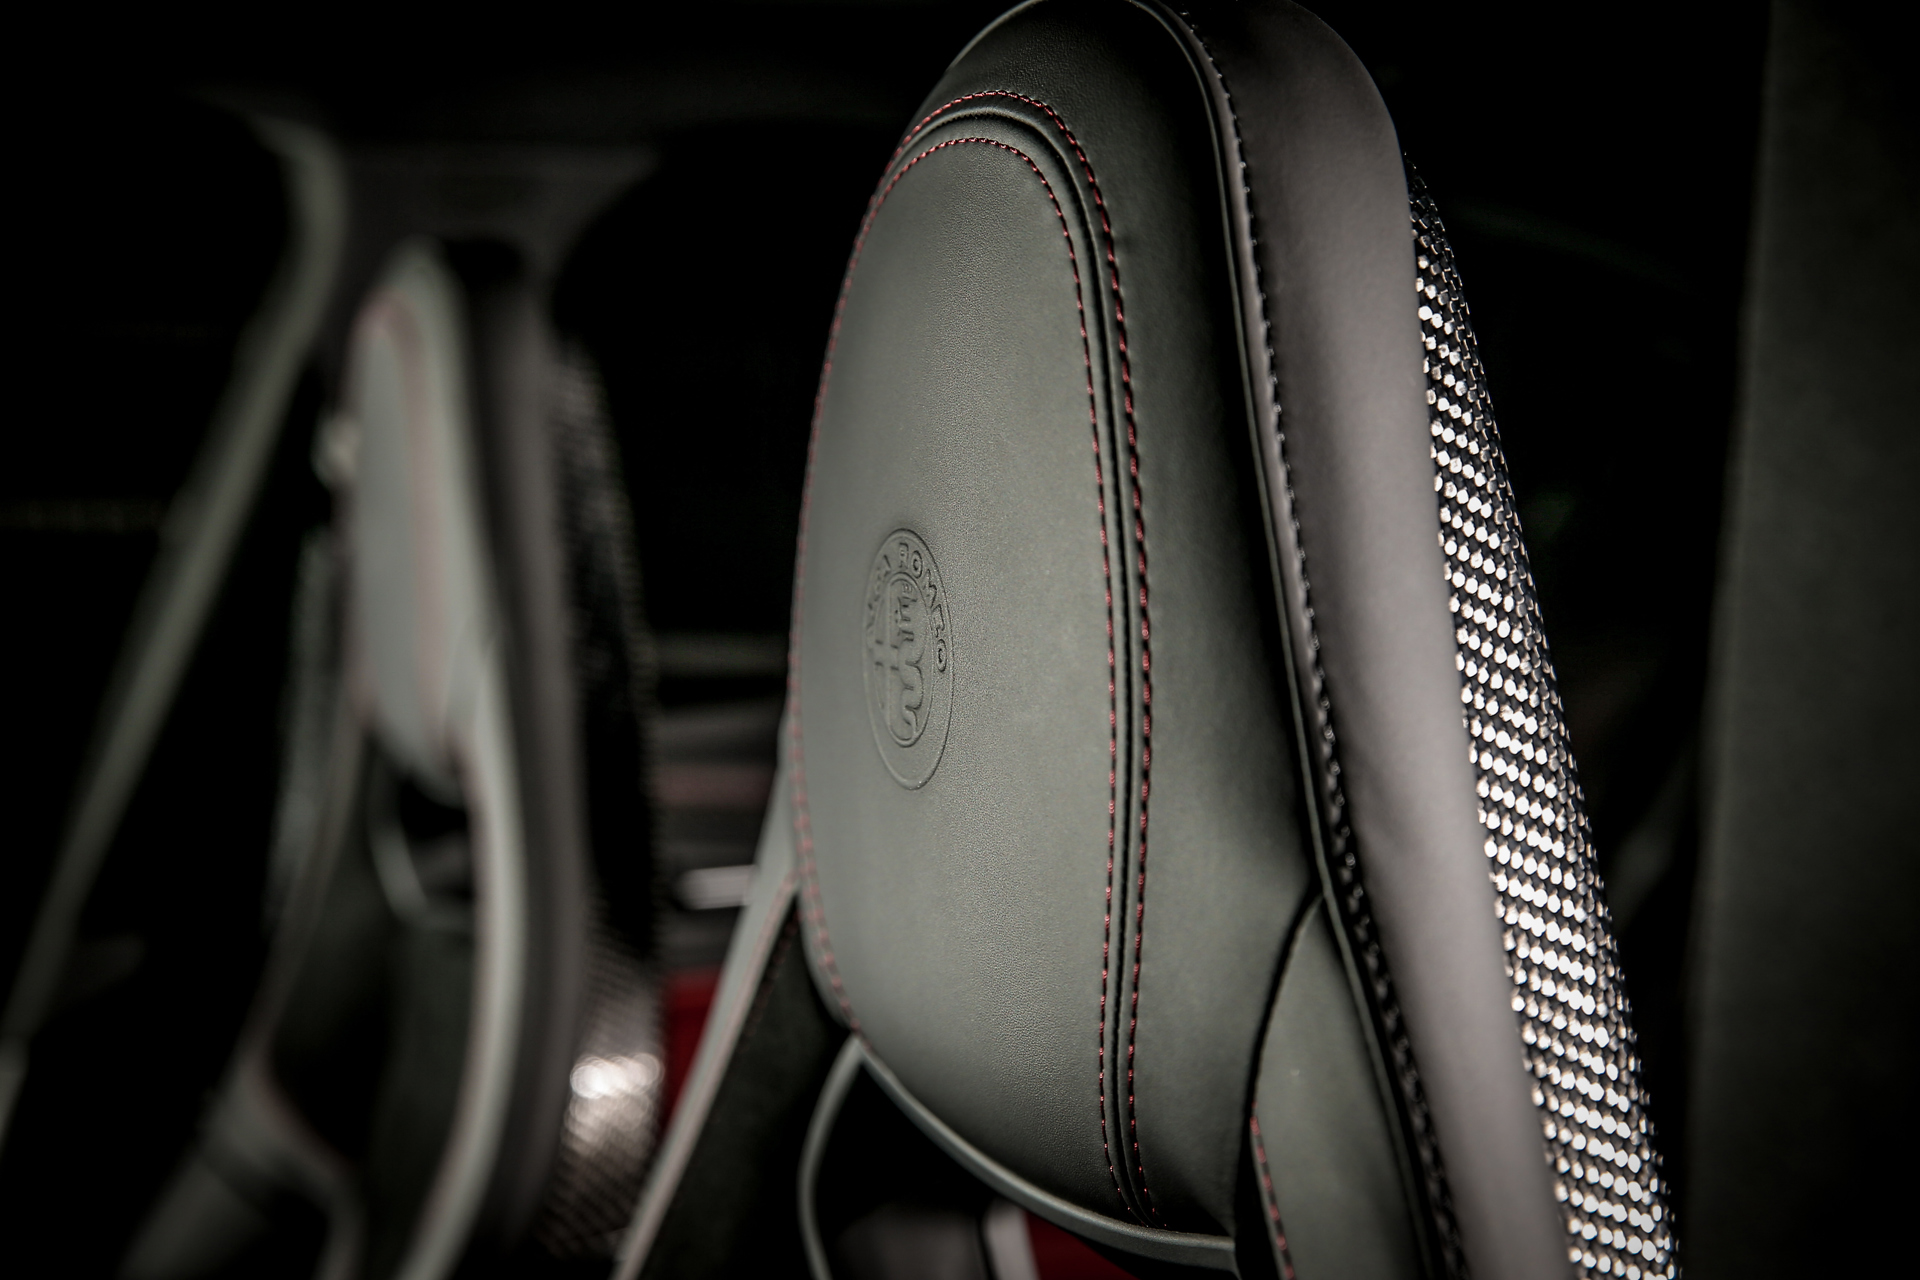 180614_Alfa-Romeo_ORAX2178b.jpg